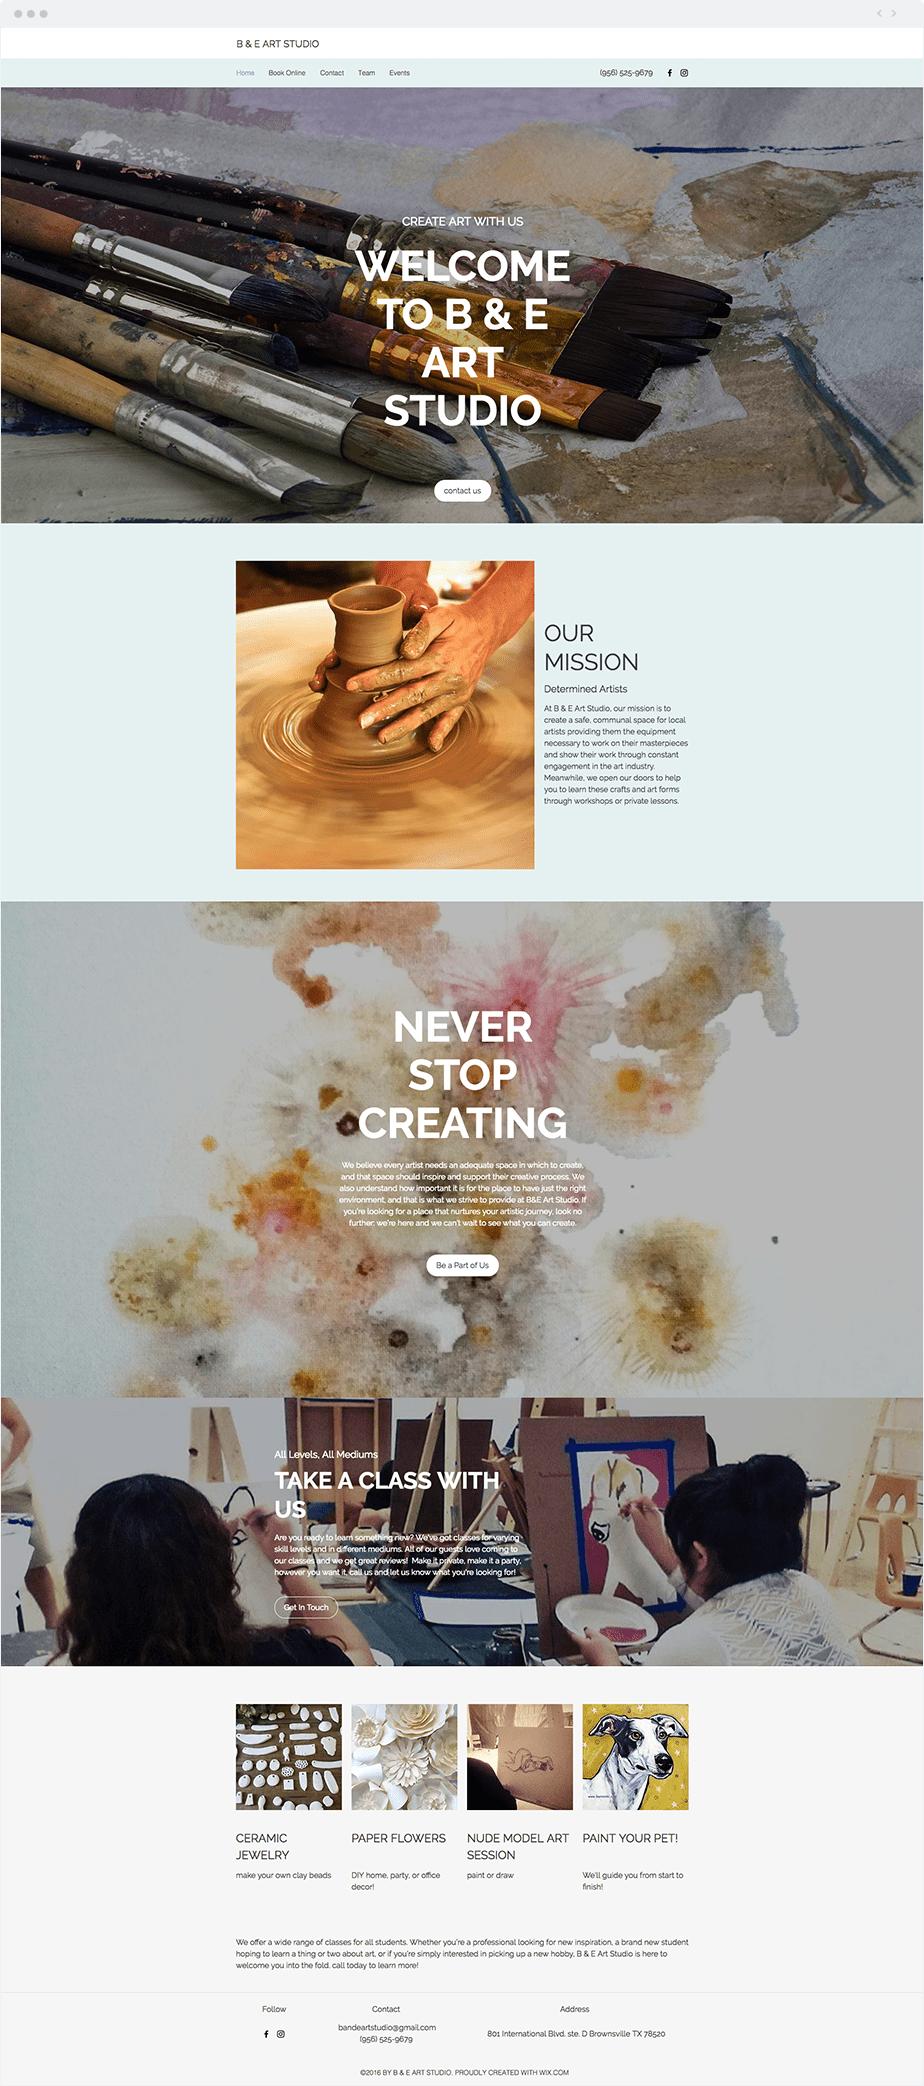 Wix Bookings Website: B & E Art Studio